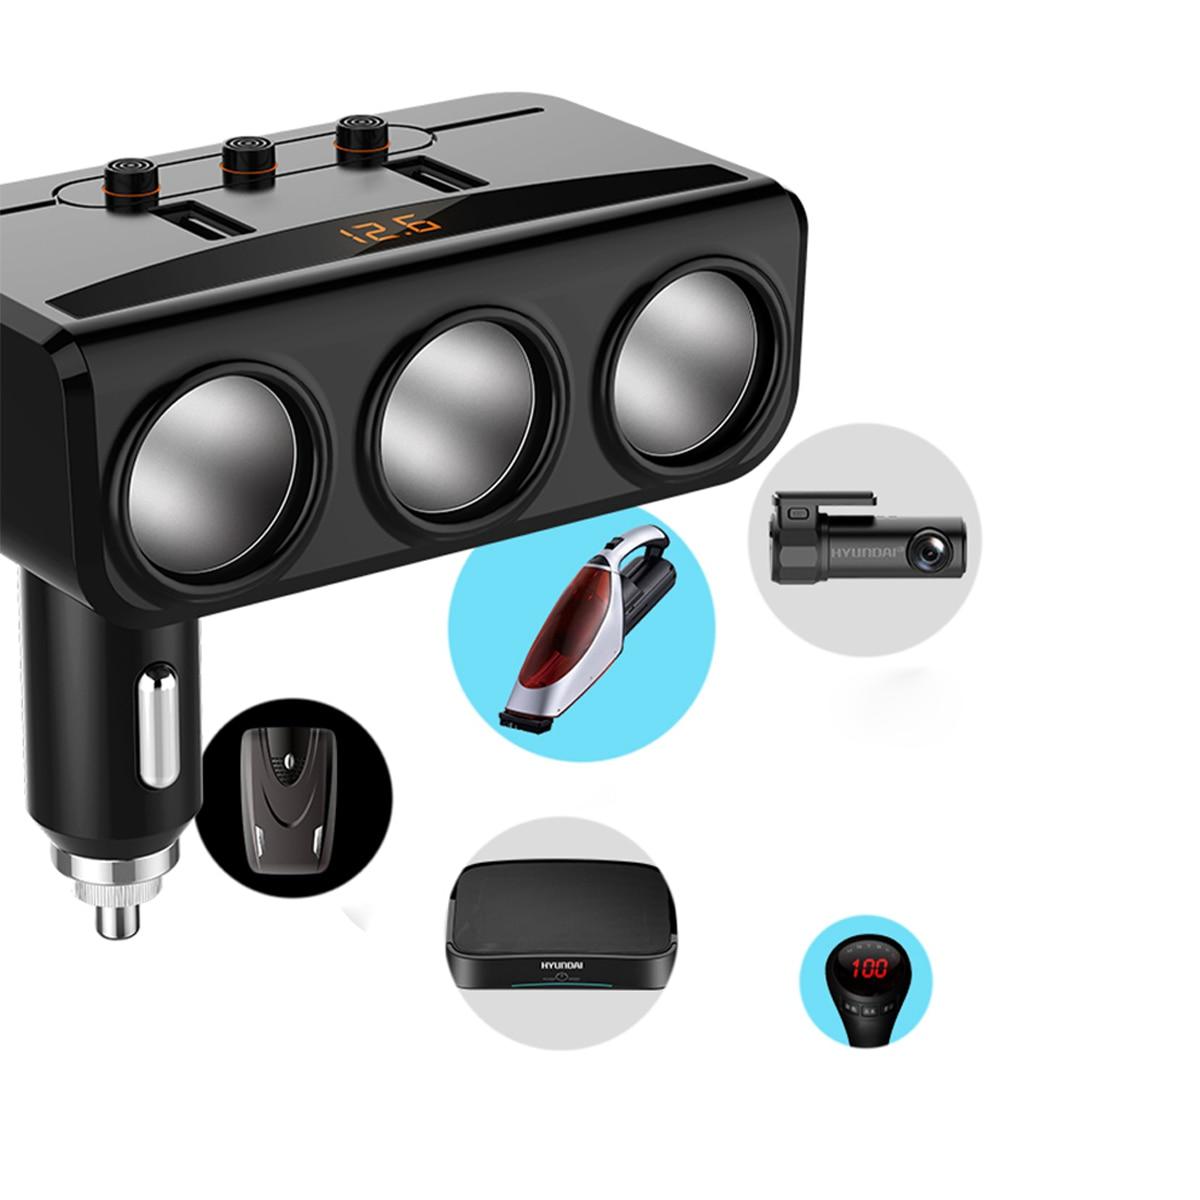 HY29 12 24V LED Display Dual USB 5V 3 1A Car Charger Motors Intelligent Voltage Detection 3 ports Car Cigarette Lighter in Cigarette Lighter from Automobiles Motorcycles